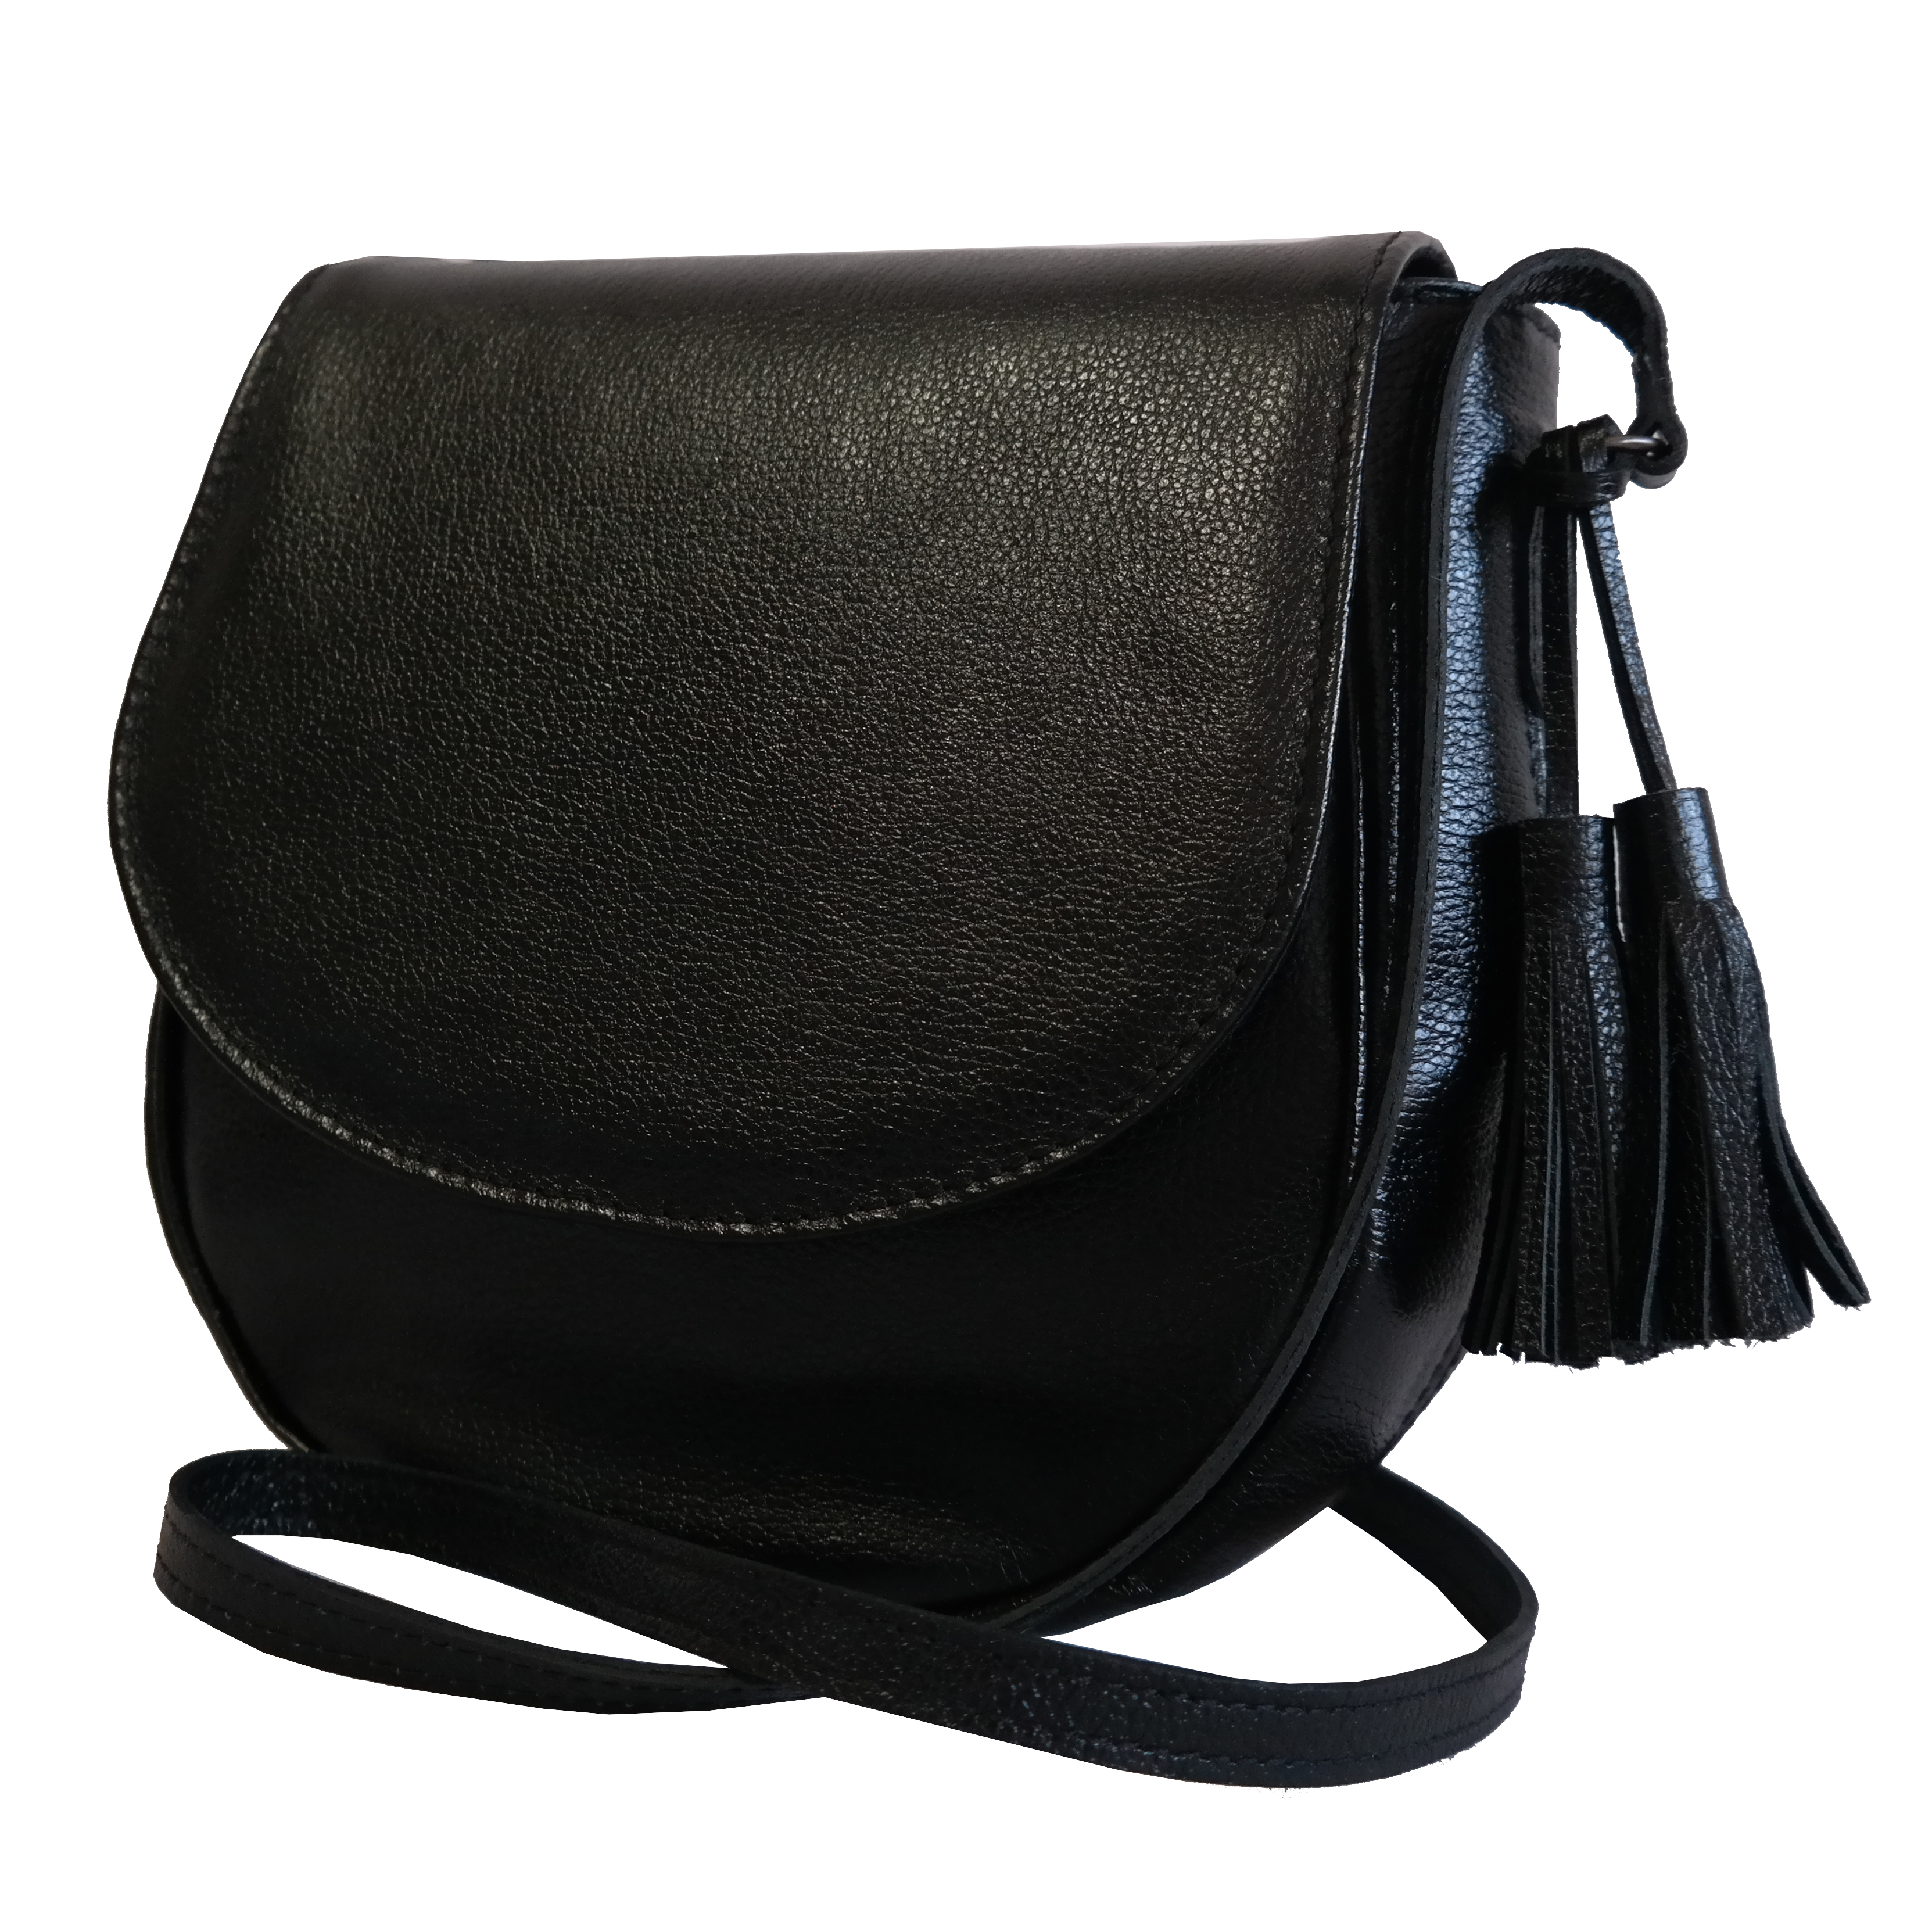 Saddle Bag Couro Preto